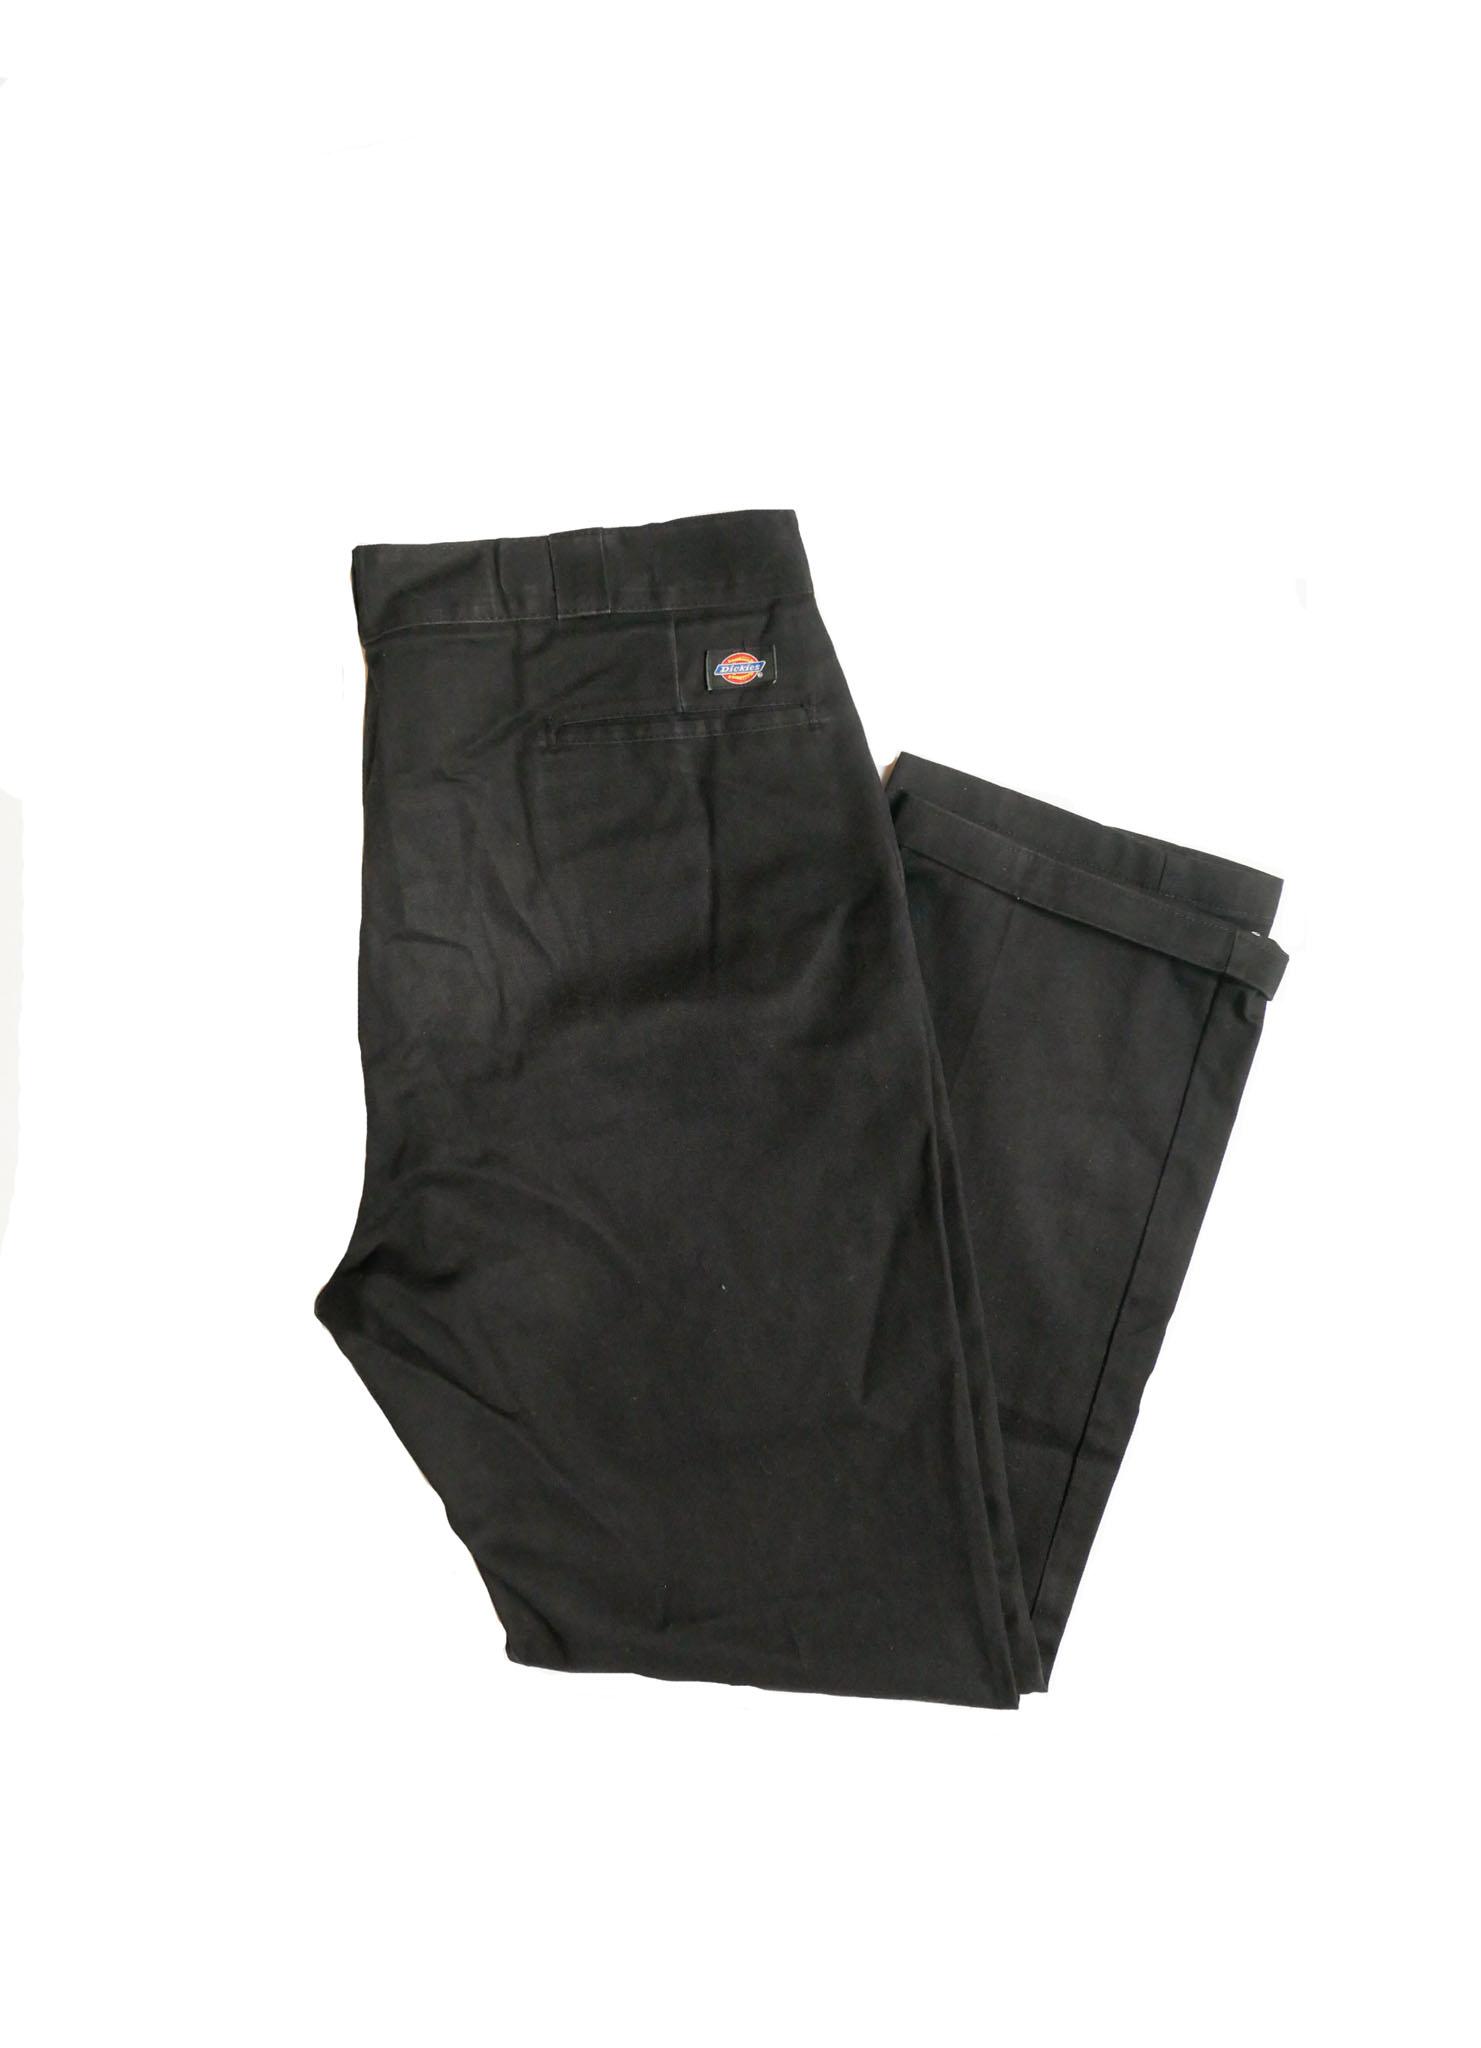 Dickies 874 Original Work Pants Black